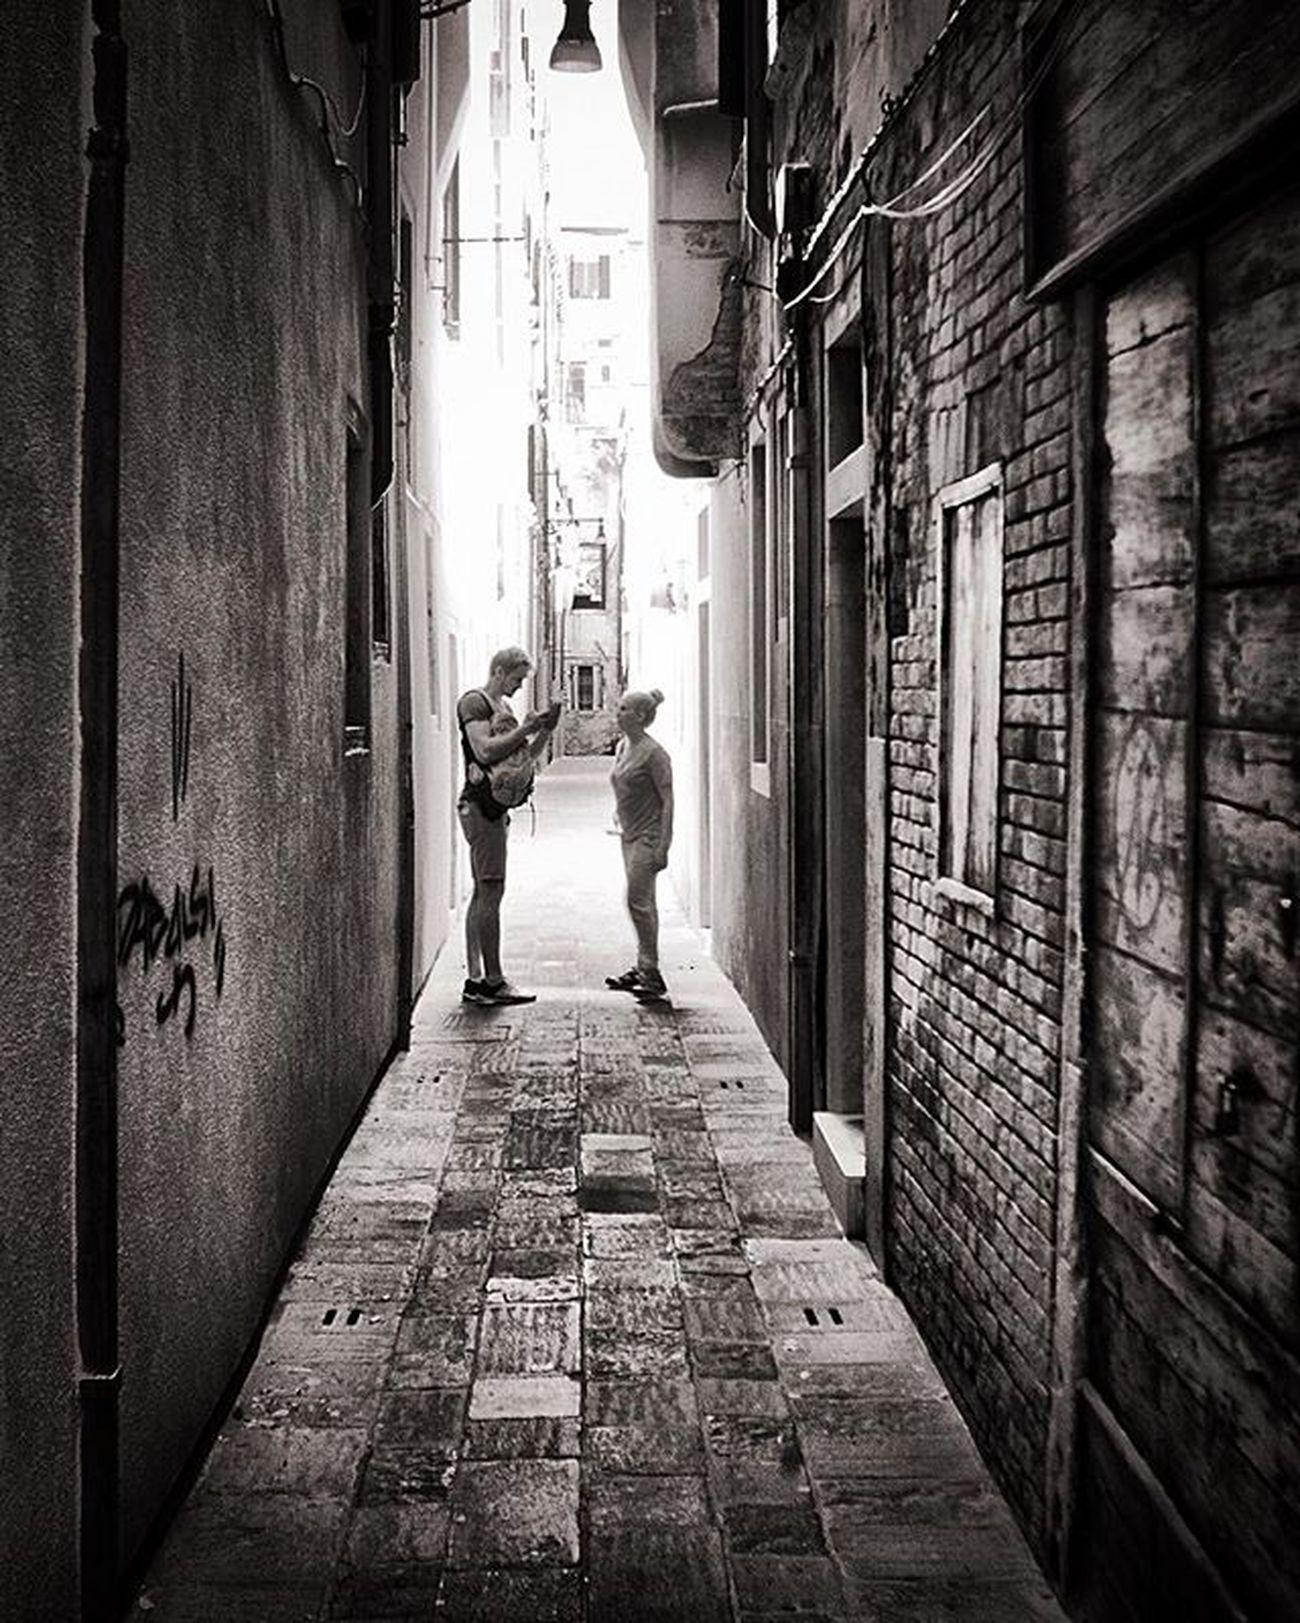 Bw Blackandwhite Noiretblanc Streetphotography Rsa_bw Bnw_demand Mafia_bnwlove Youmobile Wearegrryo Outofthephone Tinycollective Streetphotographers Gspc Hikaricreative Hartcollective Thesmartview Streetdreamsmag Streetscenesmagazine Commcam Ig_italy Igersitalia Igersitaly Italy